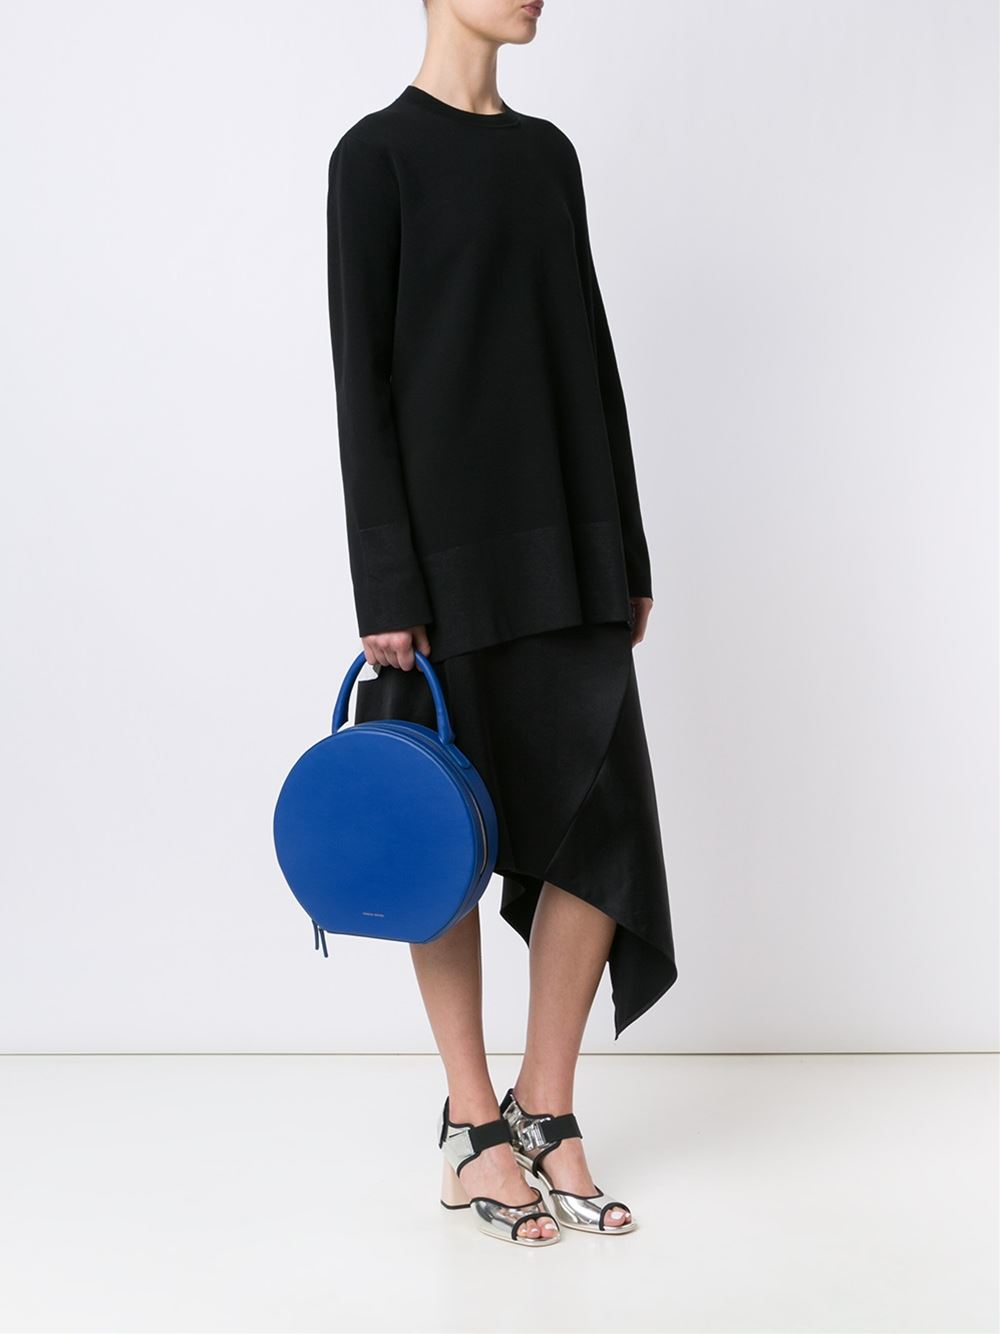 Mansur Gavriel Leather Round Tote in Blue